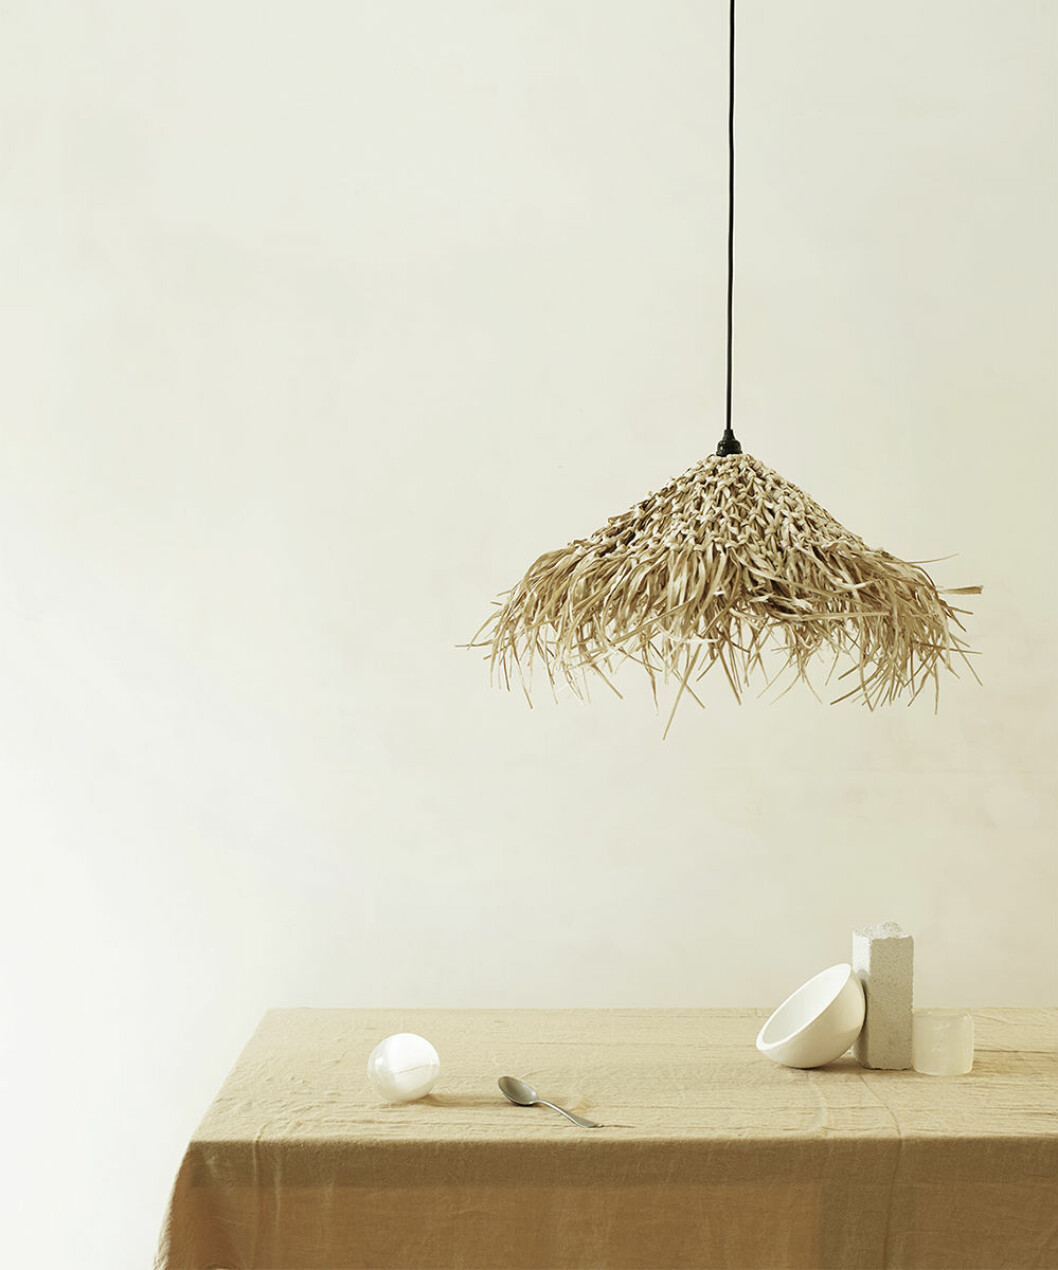 Lampa i naturmaterial från Tine K Home